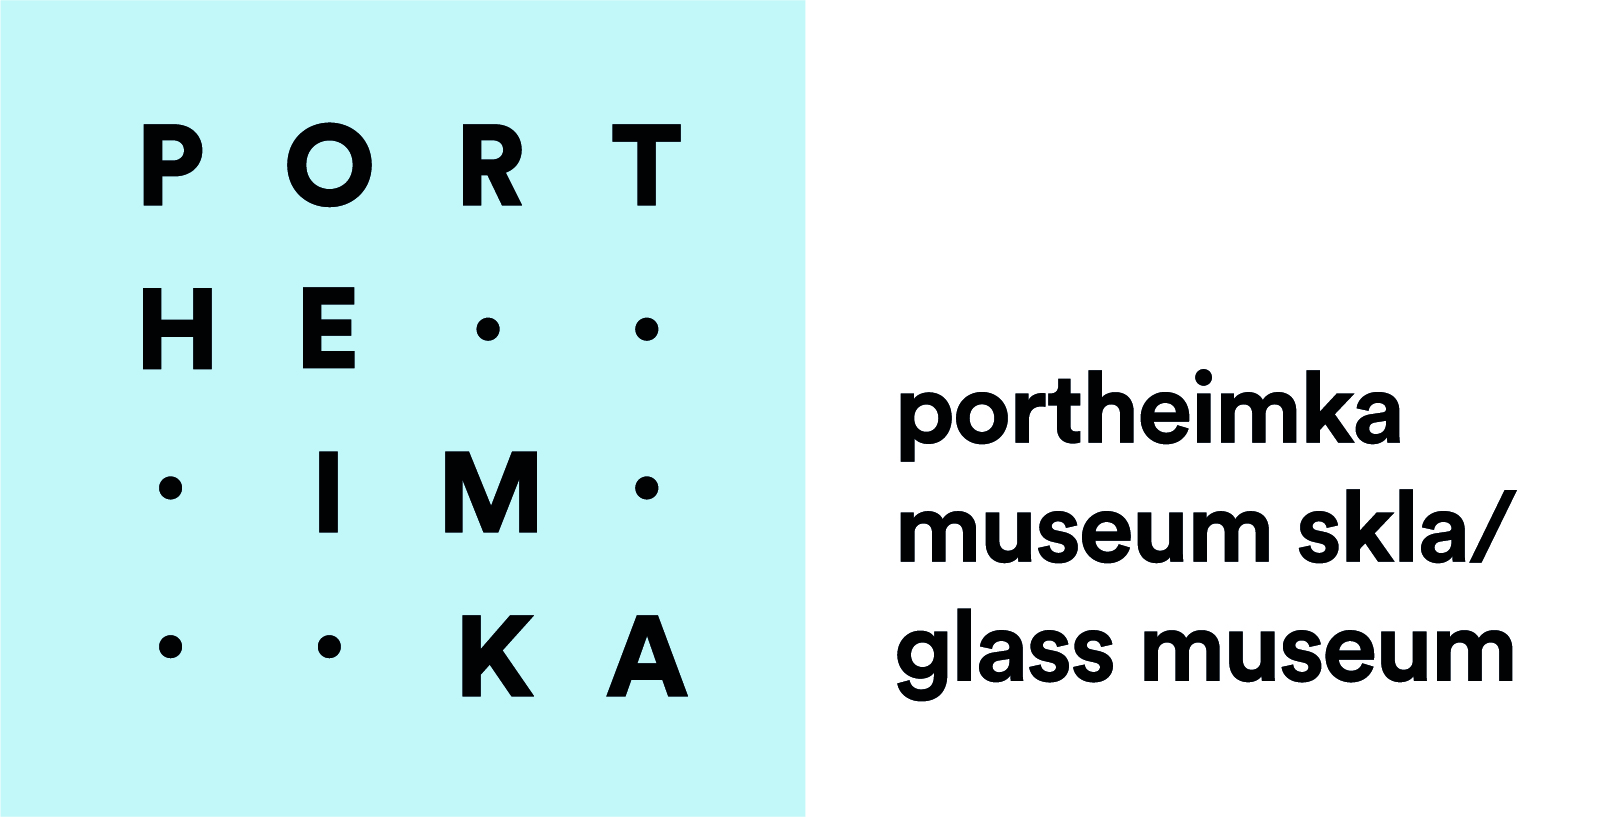 museum-skla-portheimka-uspelo-v-narodni-soutezi-muzei-gloria-musaealis